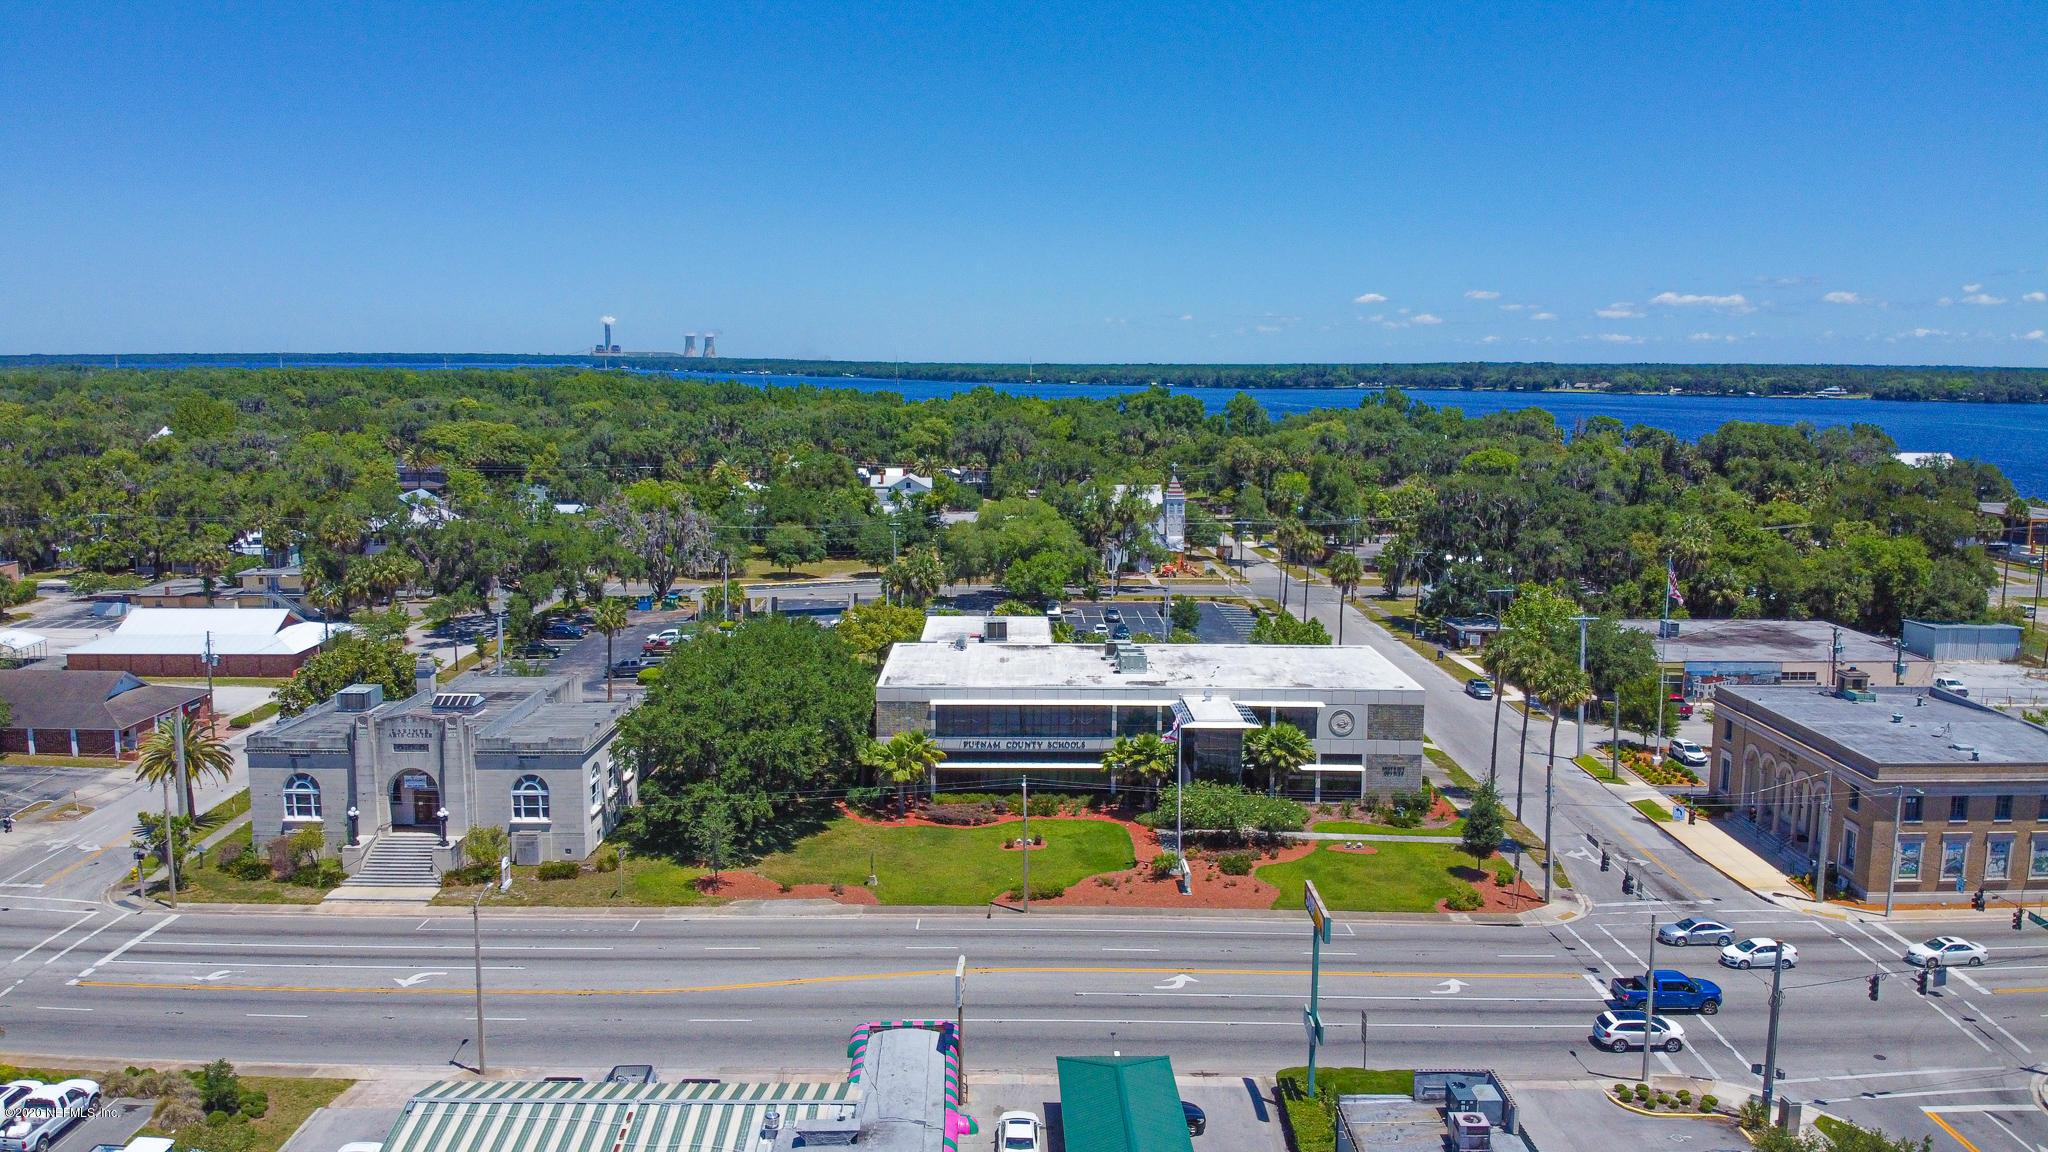 214 ST JOHNS, PALATKA, FLORIDA 32177, ,Commercial,For sale,ST JOHNS,1052768